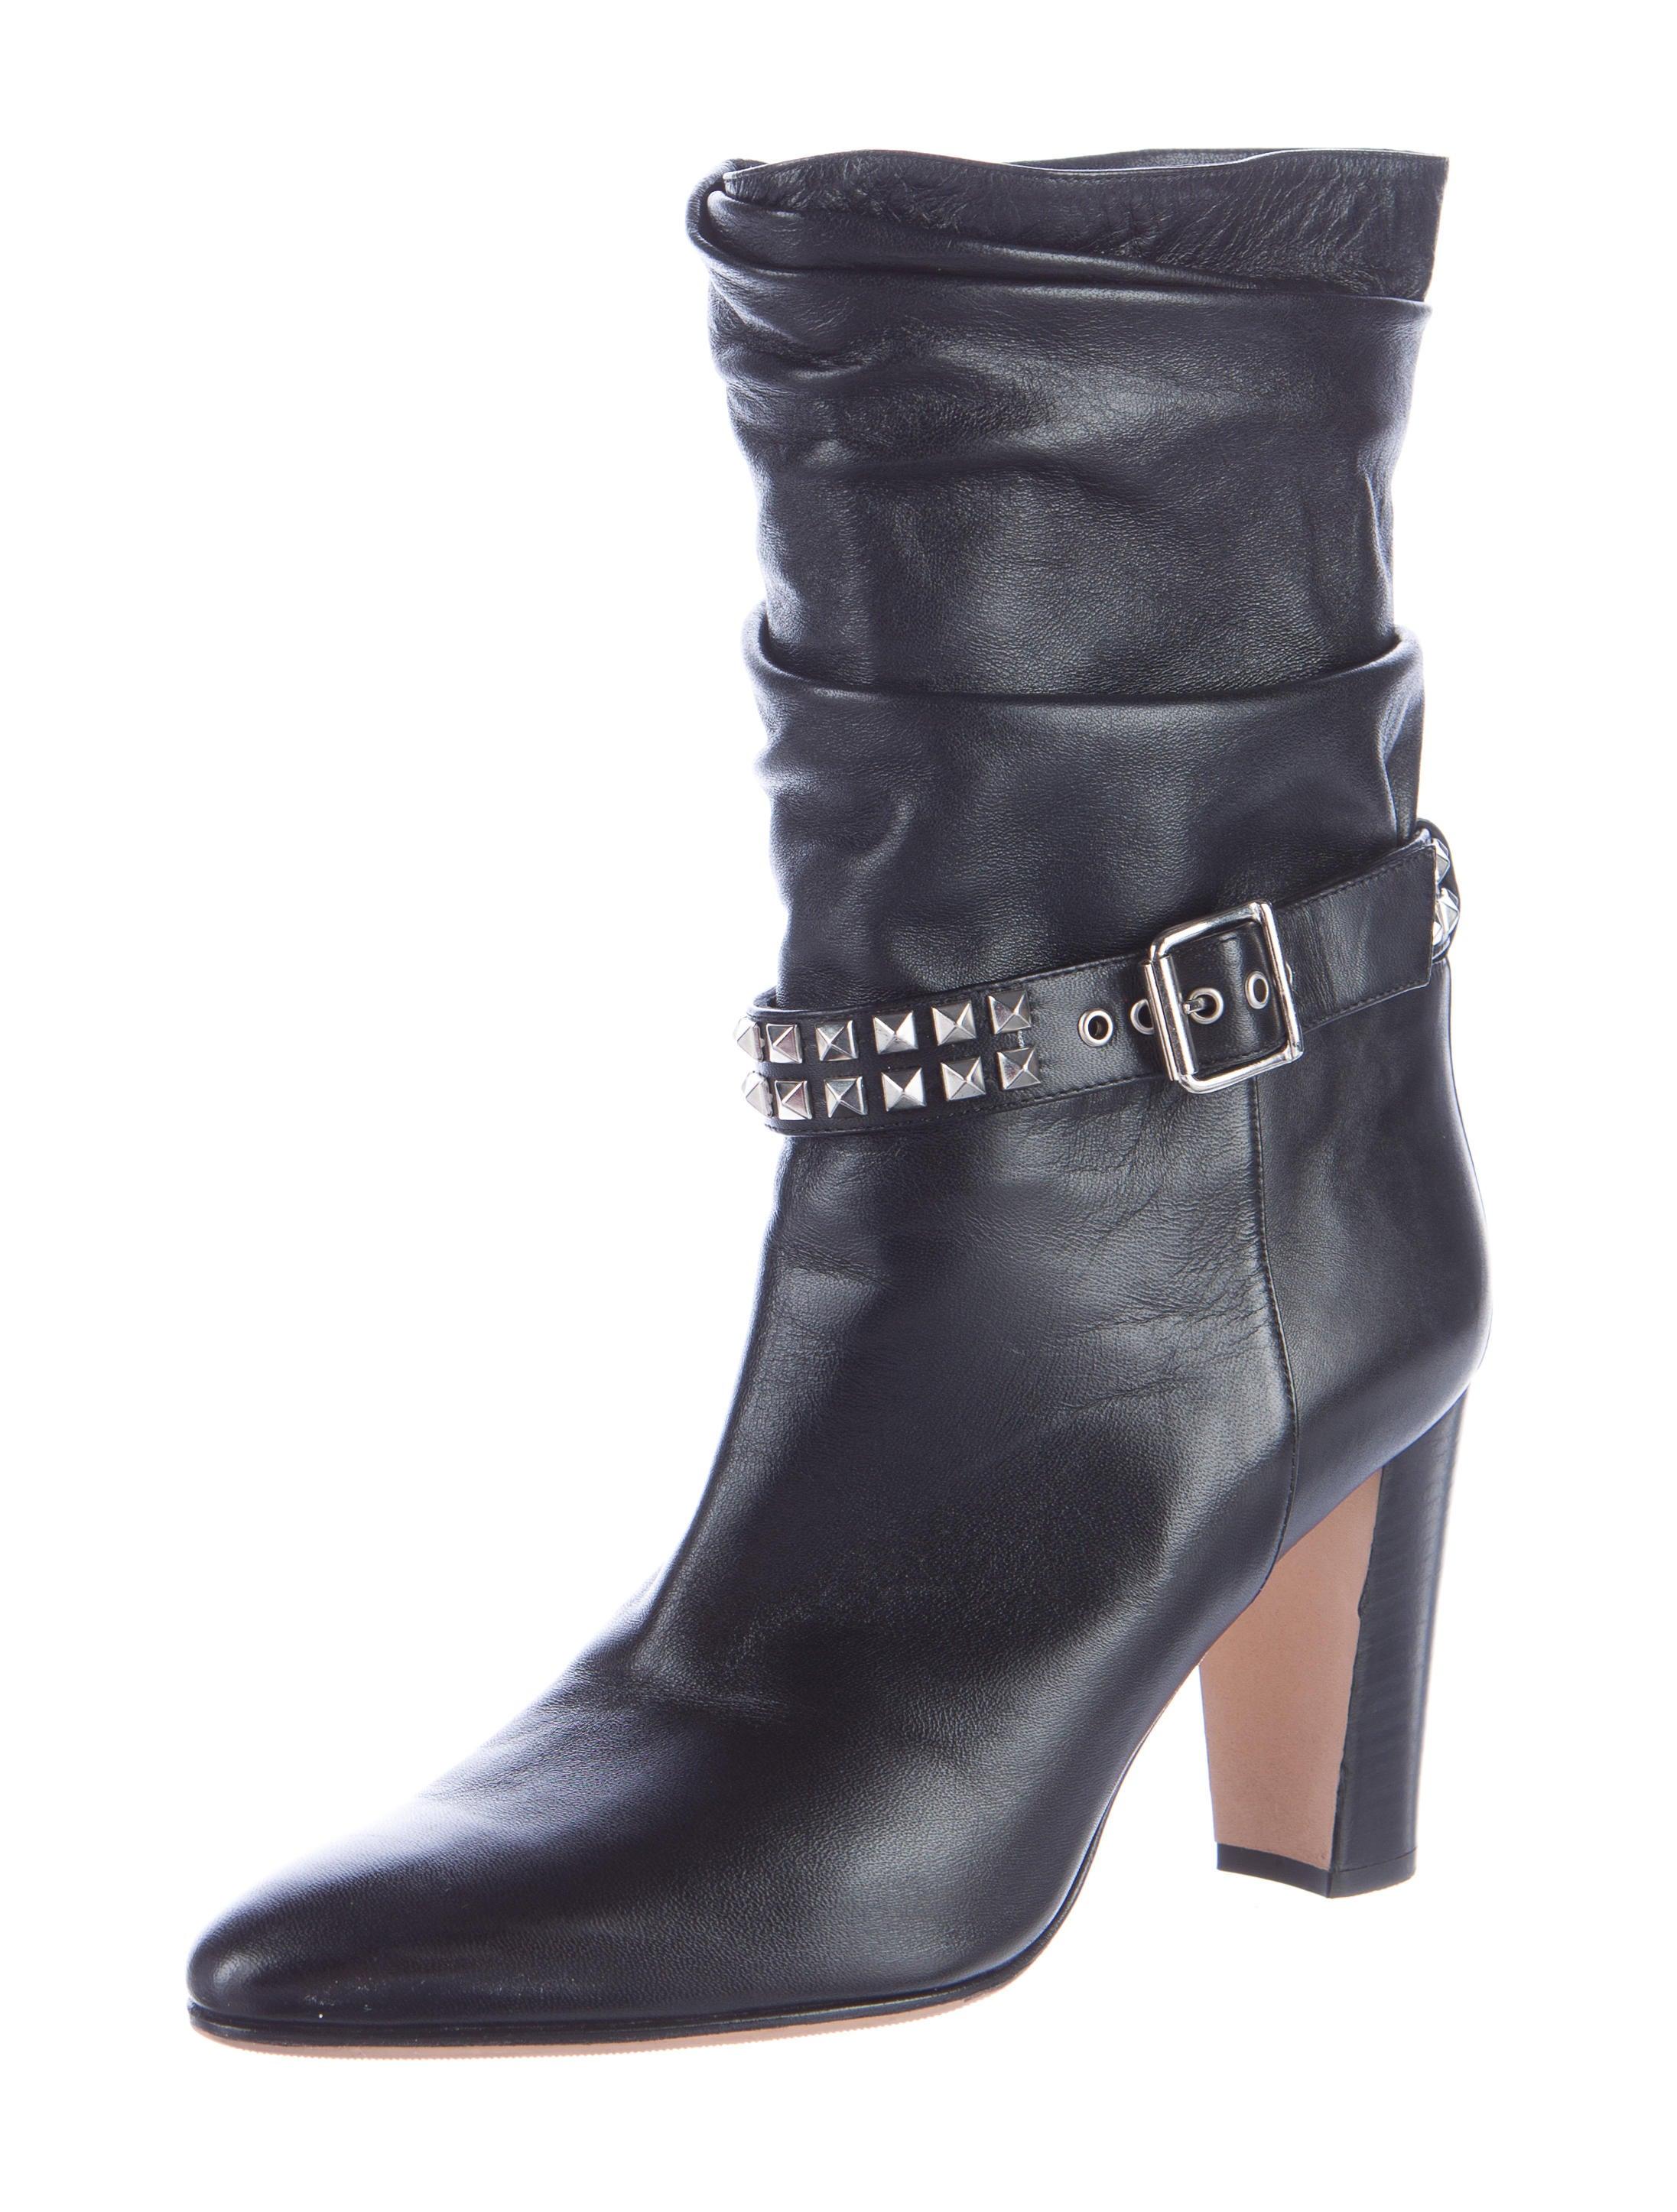 Manolo Blahnik Stud-Embellished Ankle Boots - Shoes ...